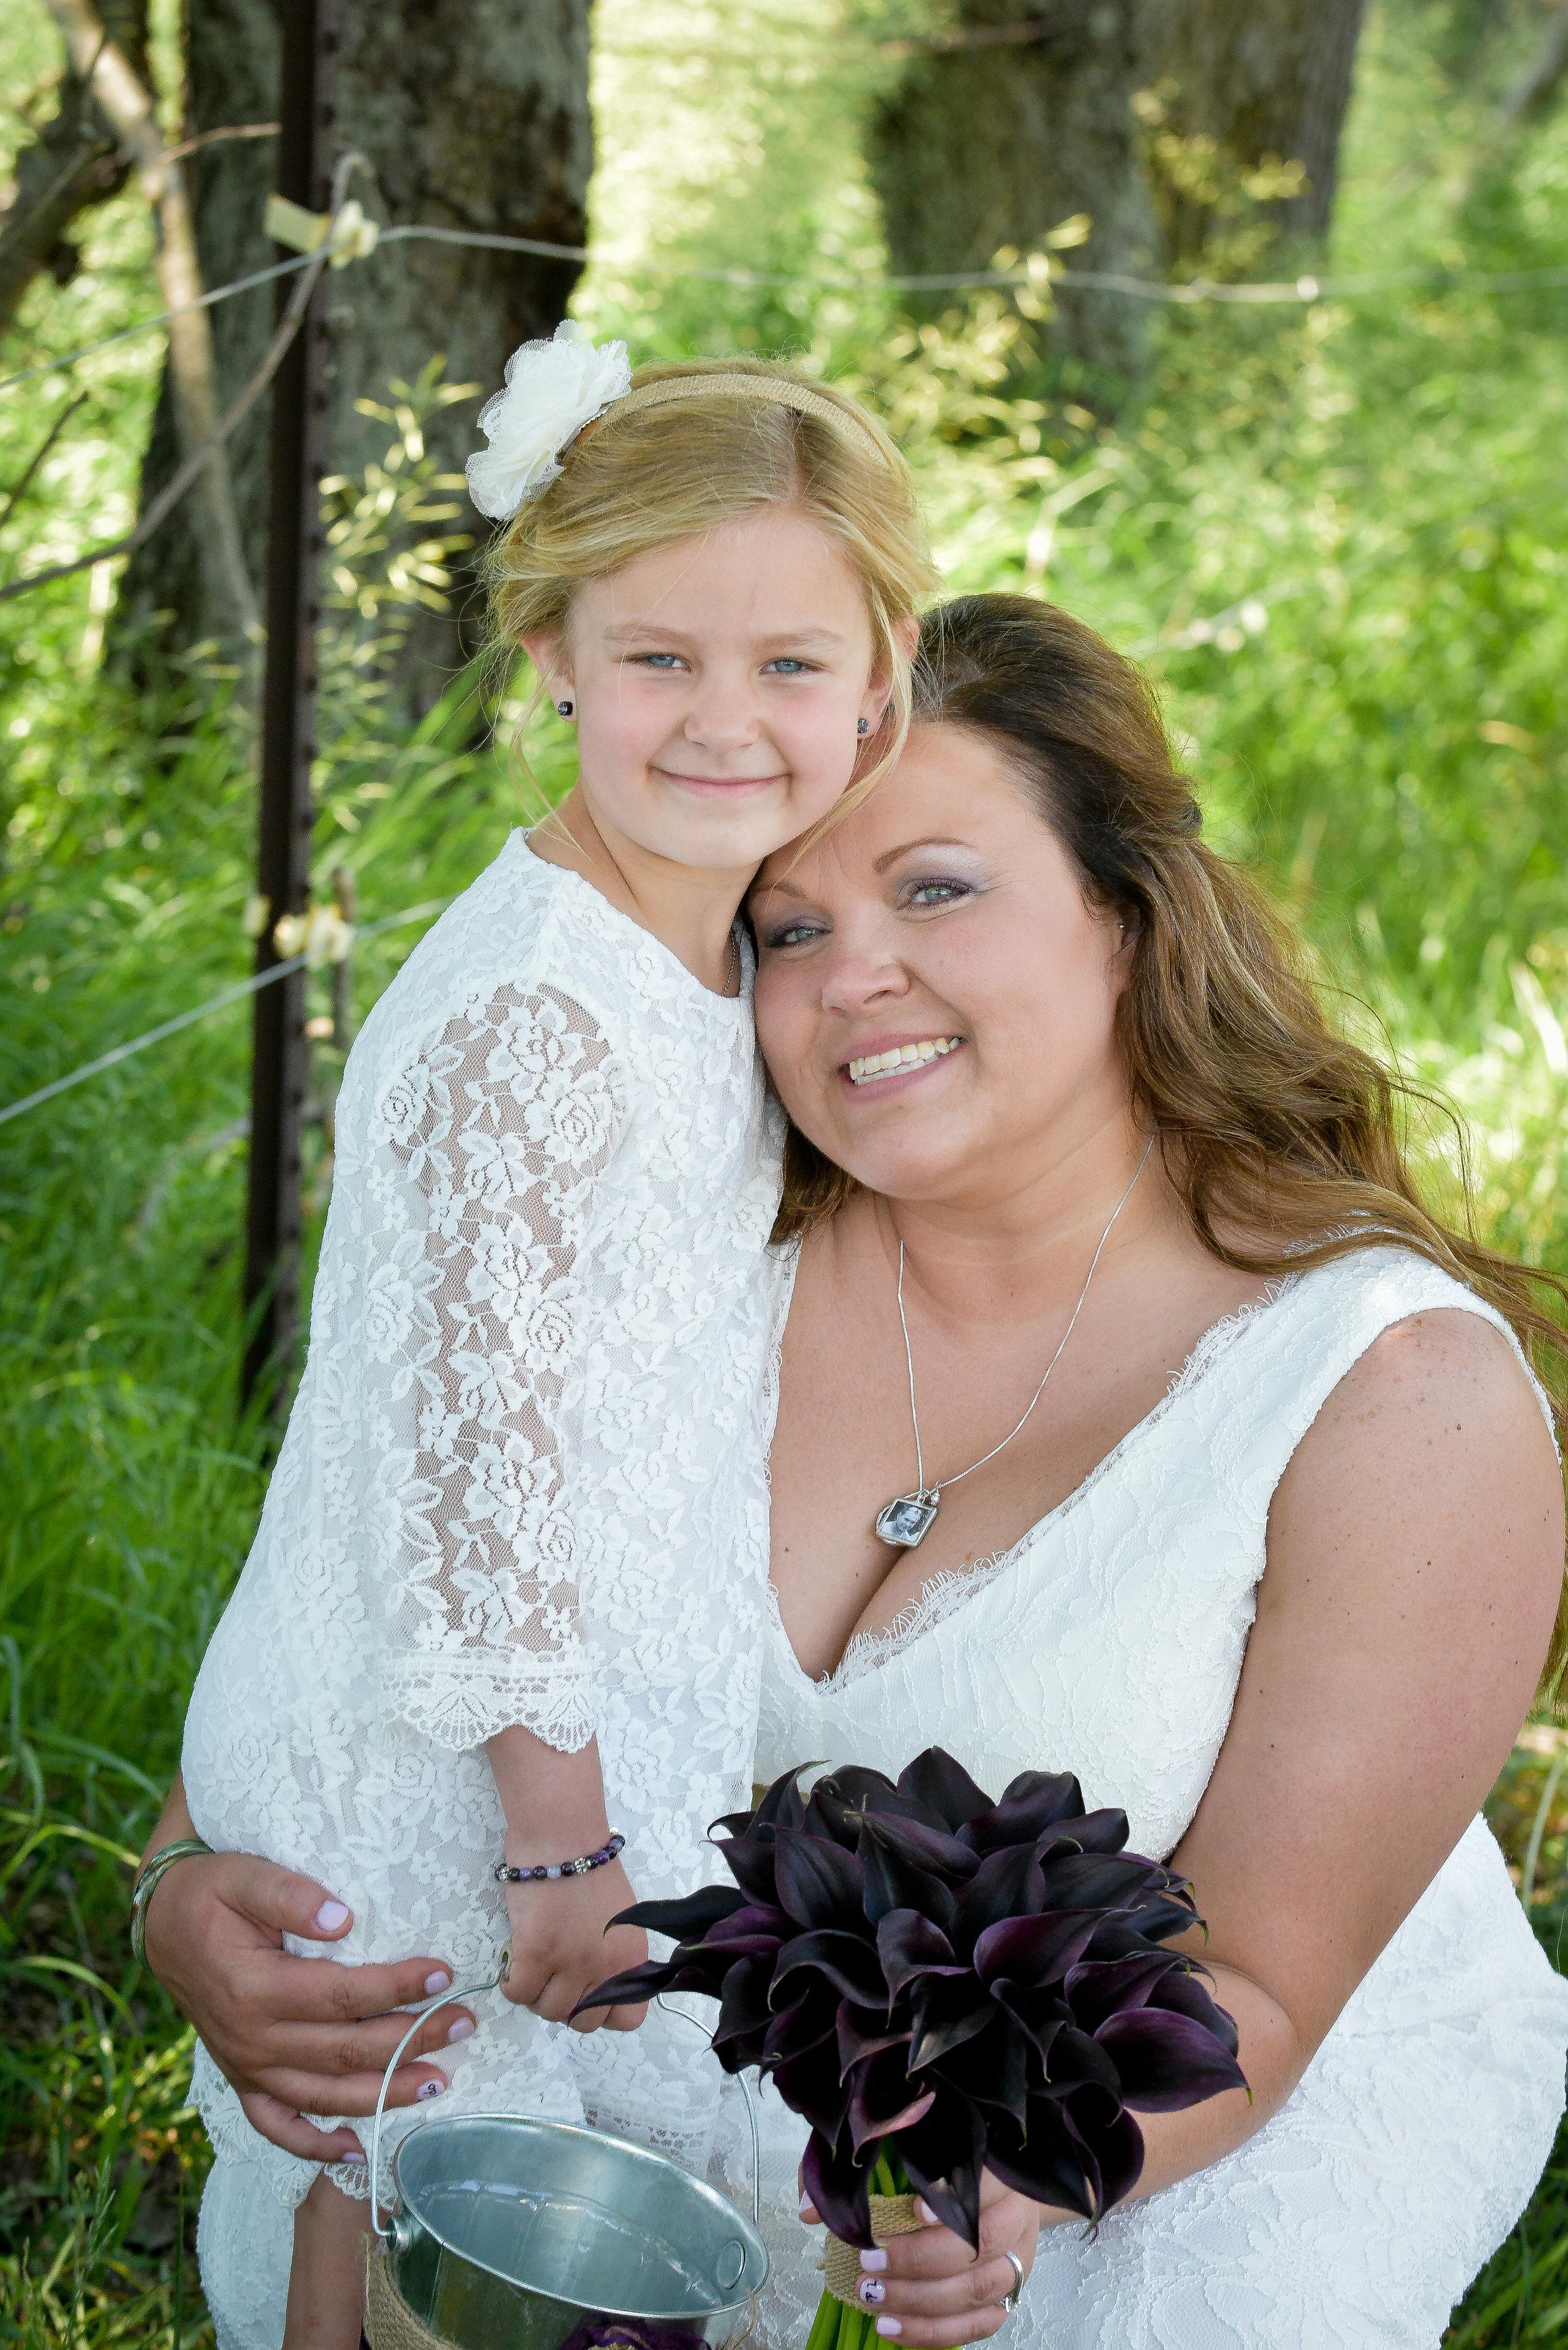 Knoxville Illinois Backyard Wedding Flower Girl